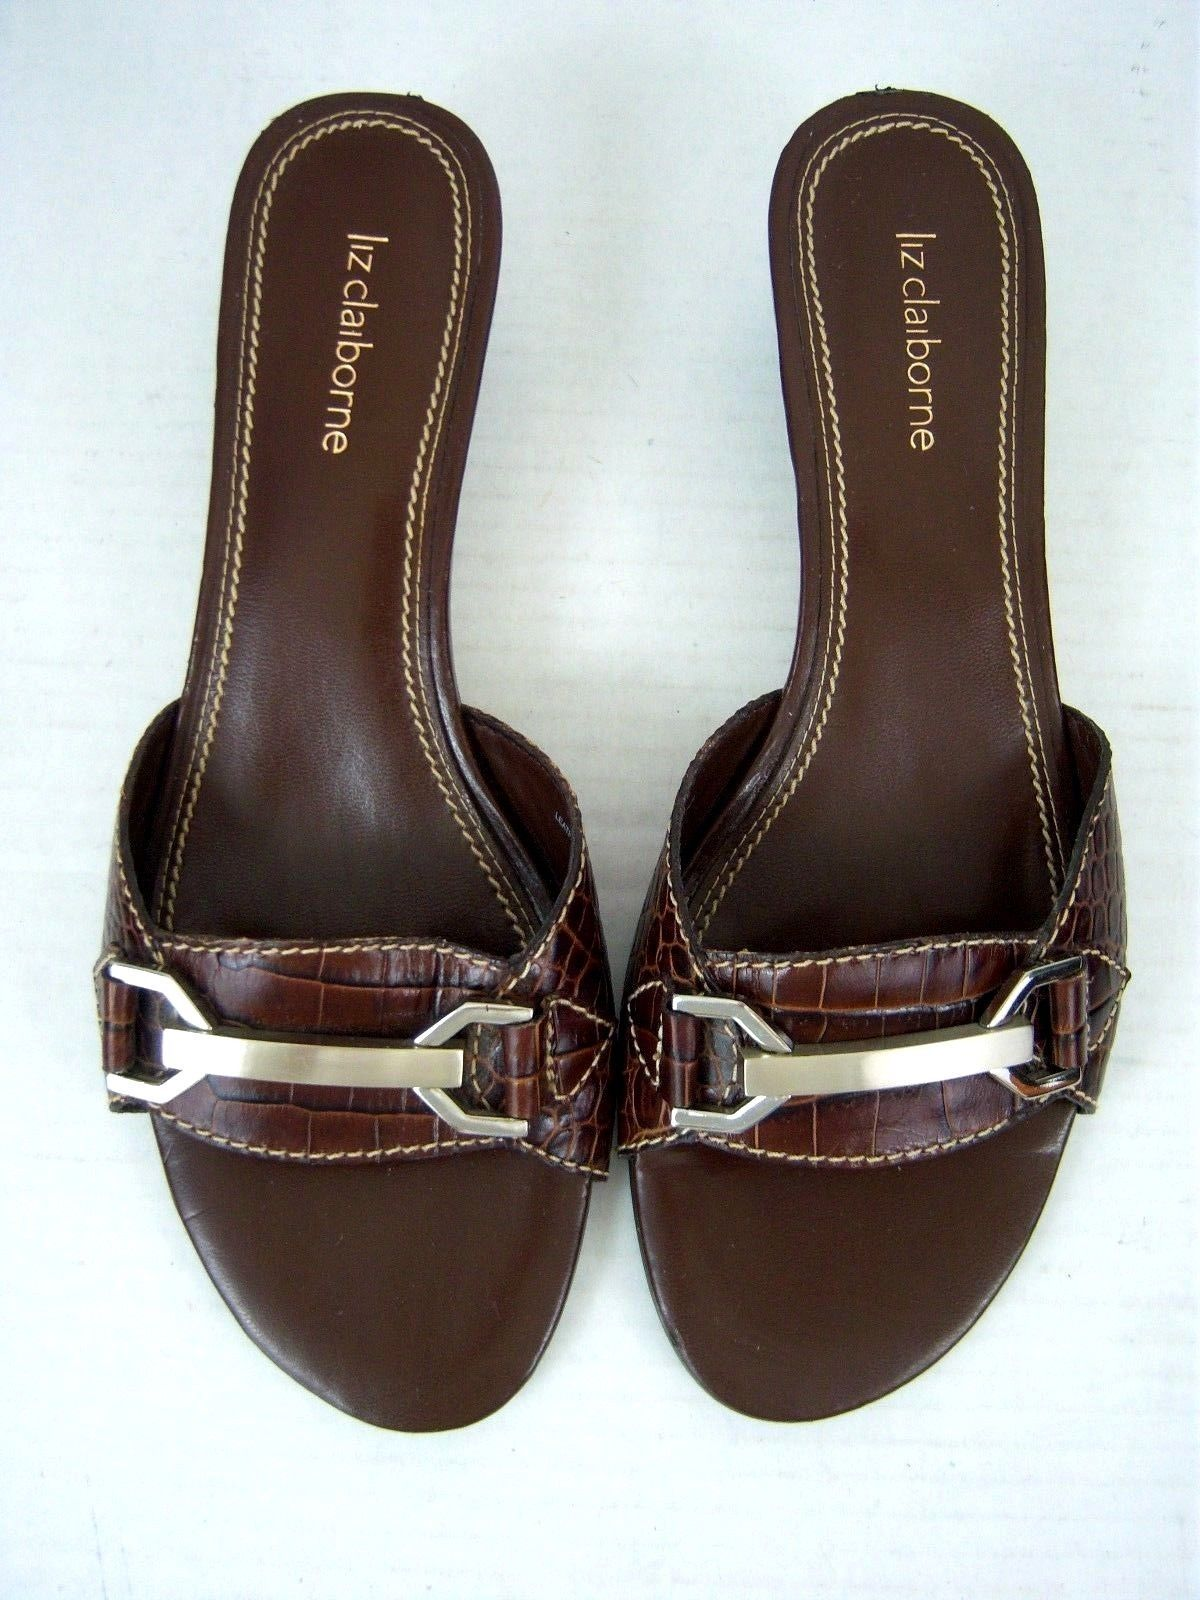 ae18332b2f12 Liz Claiborne Women s Sandals - Slides - 7-1 2M - Brown - Excellent ...